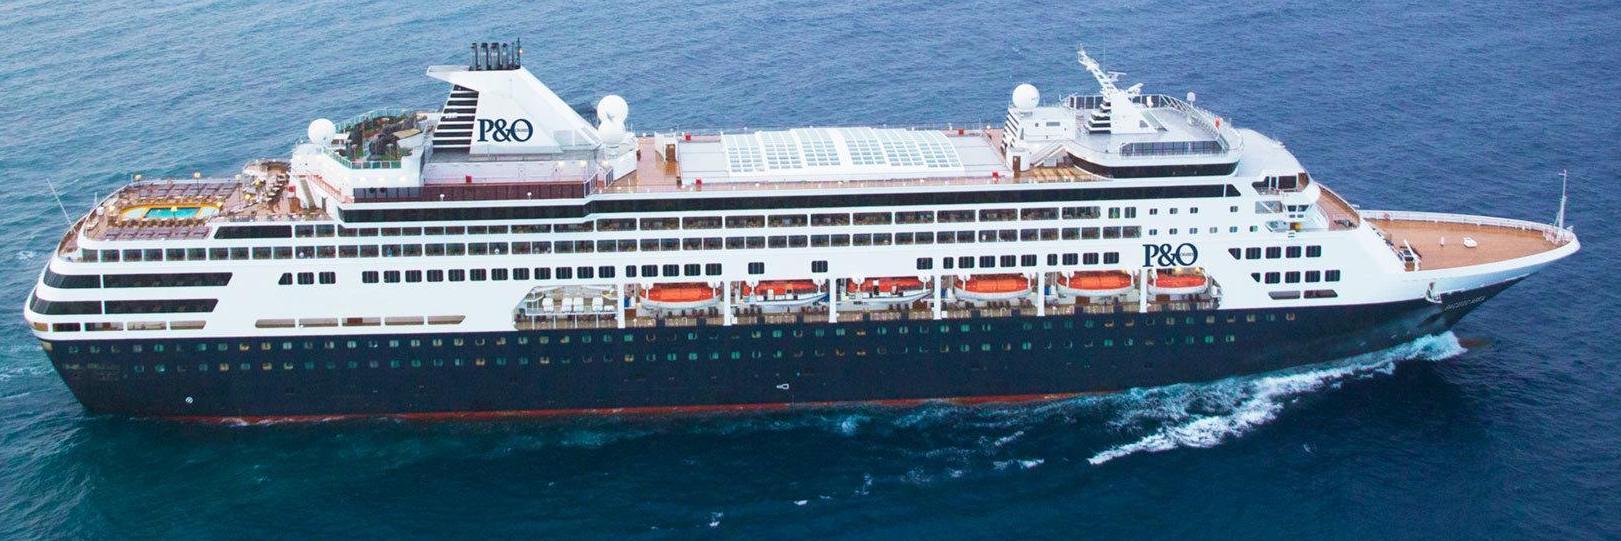 Review: P&O Cruises Australia Pacific Eden